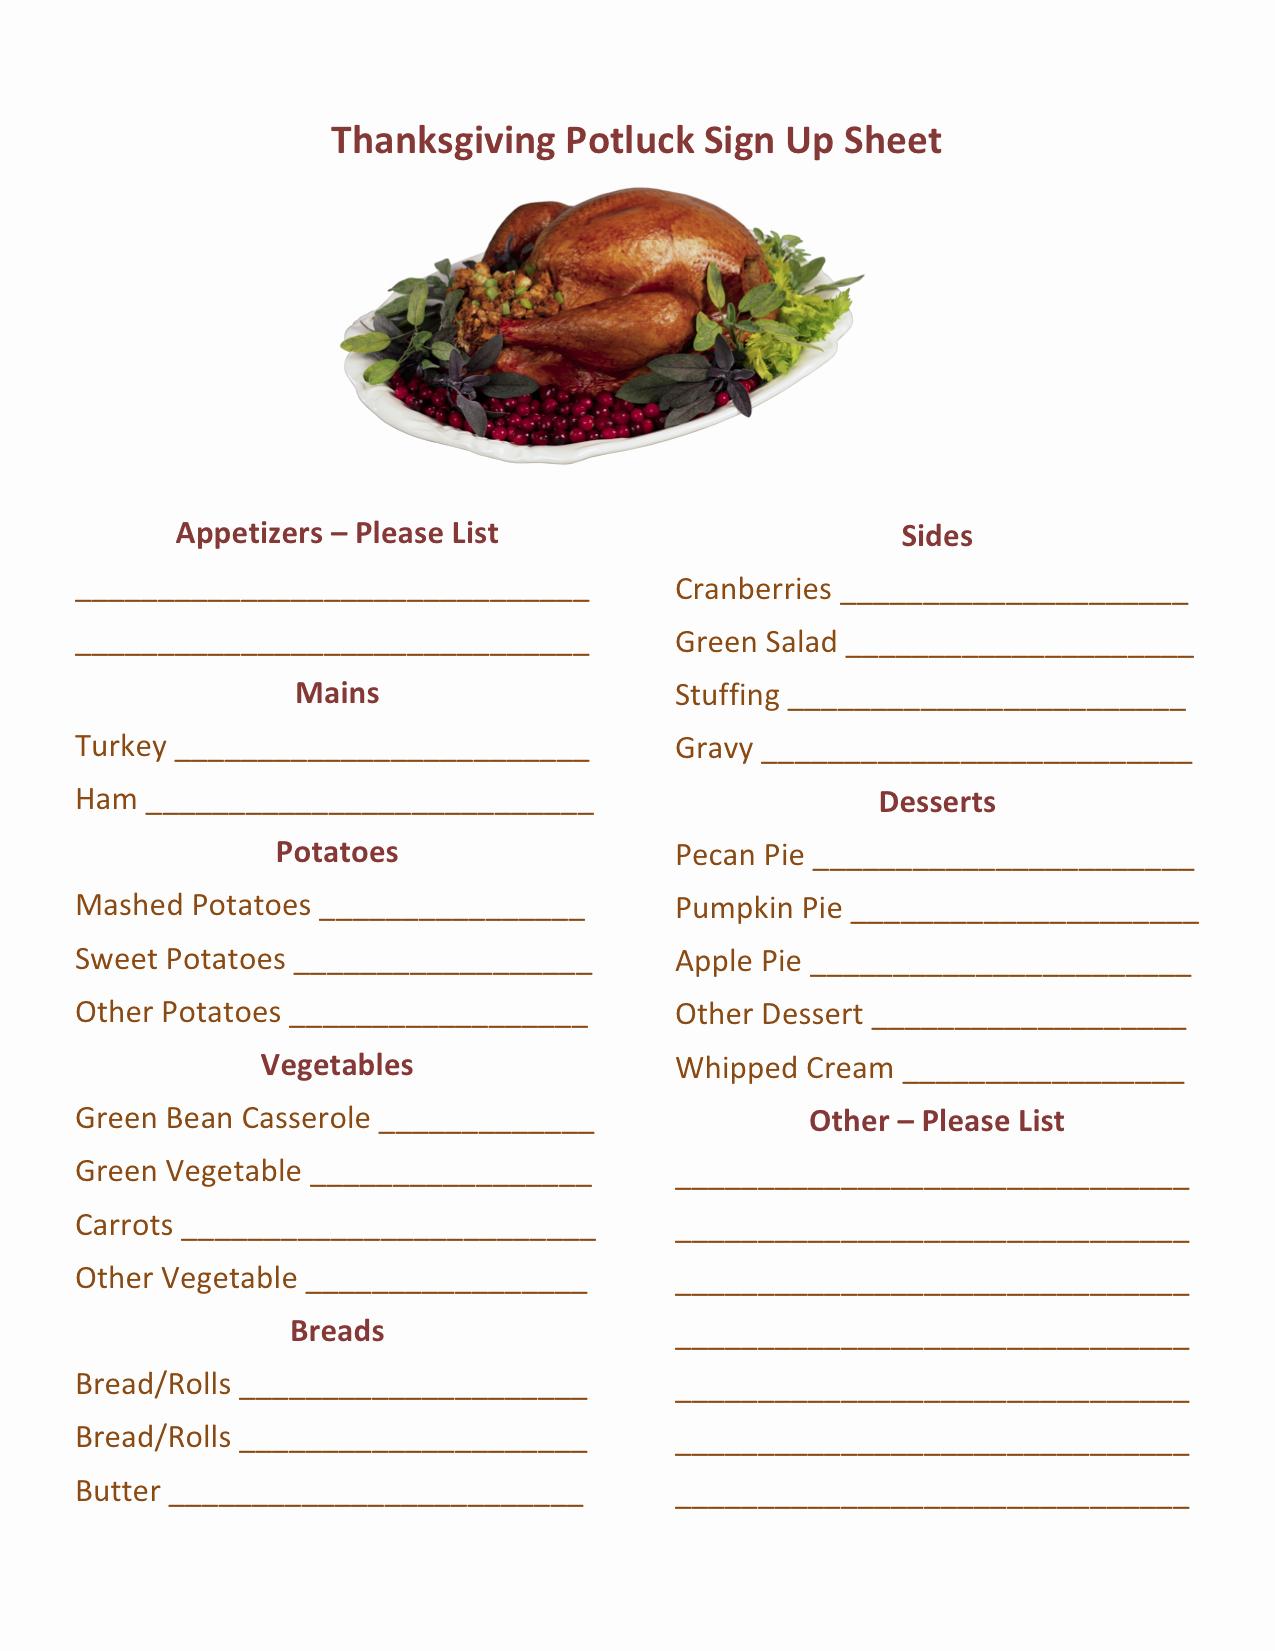 Potluck Signup Sheet Word Inspirational Thanksgiving Potluck Sign Up Printable